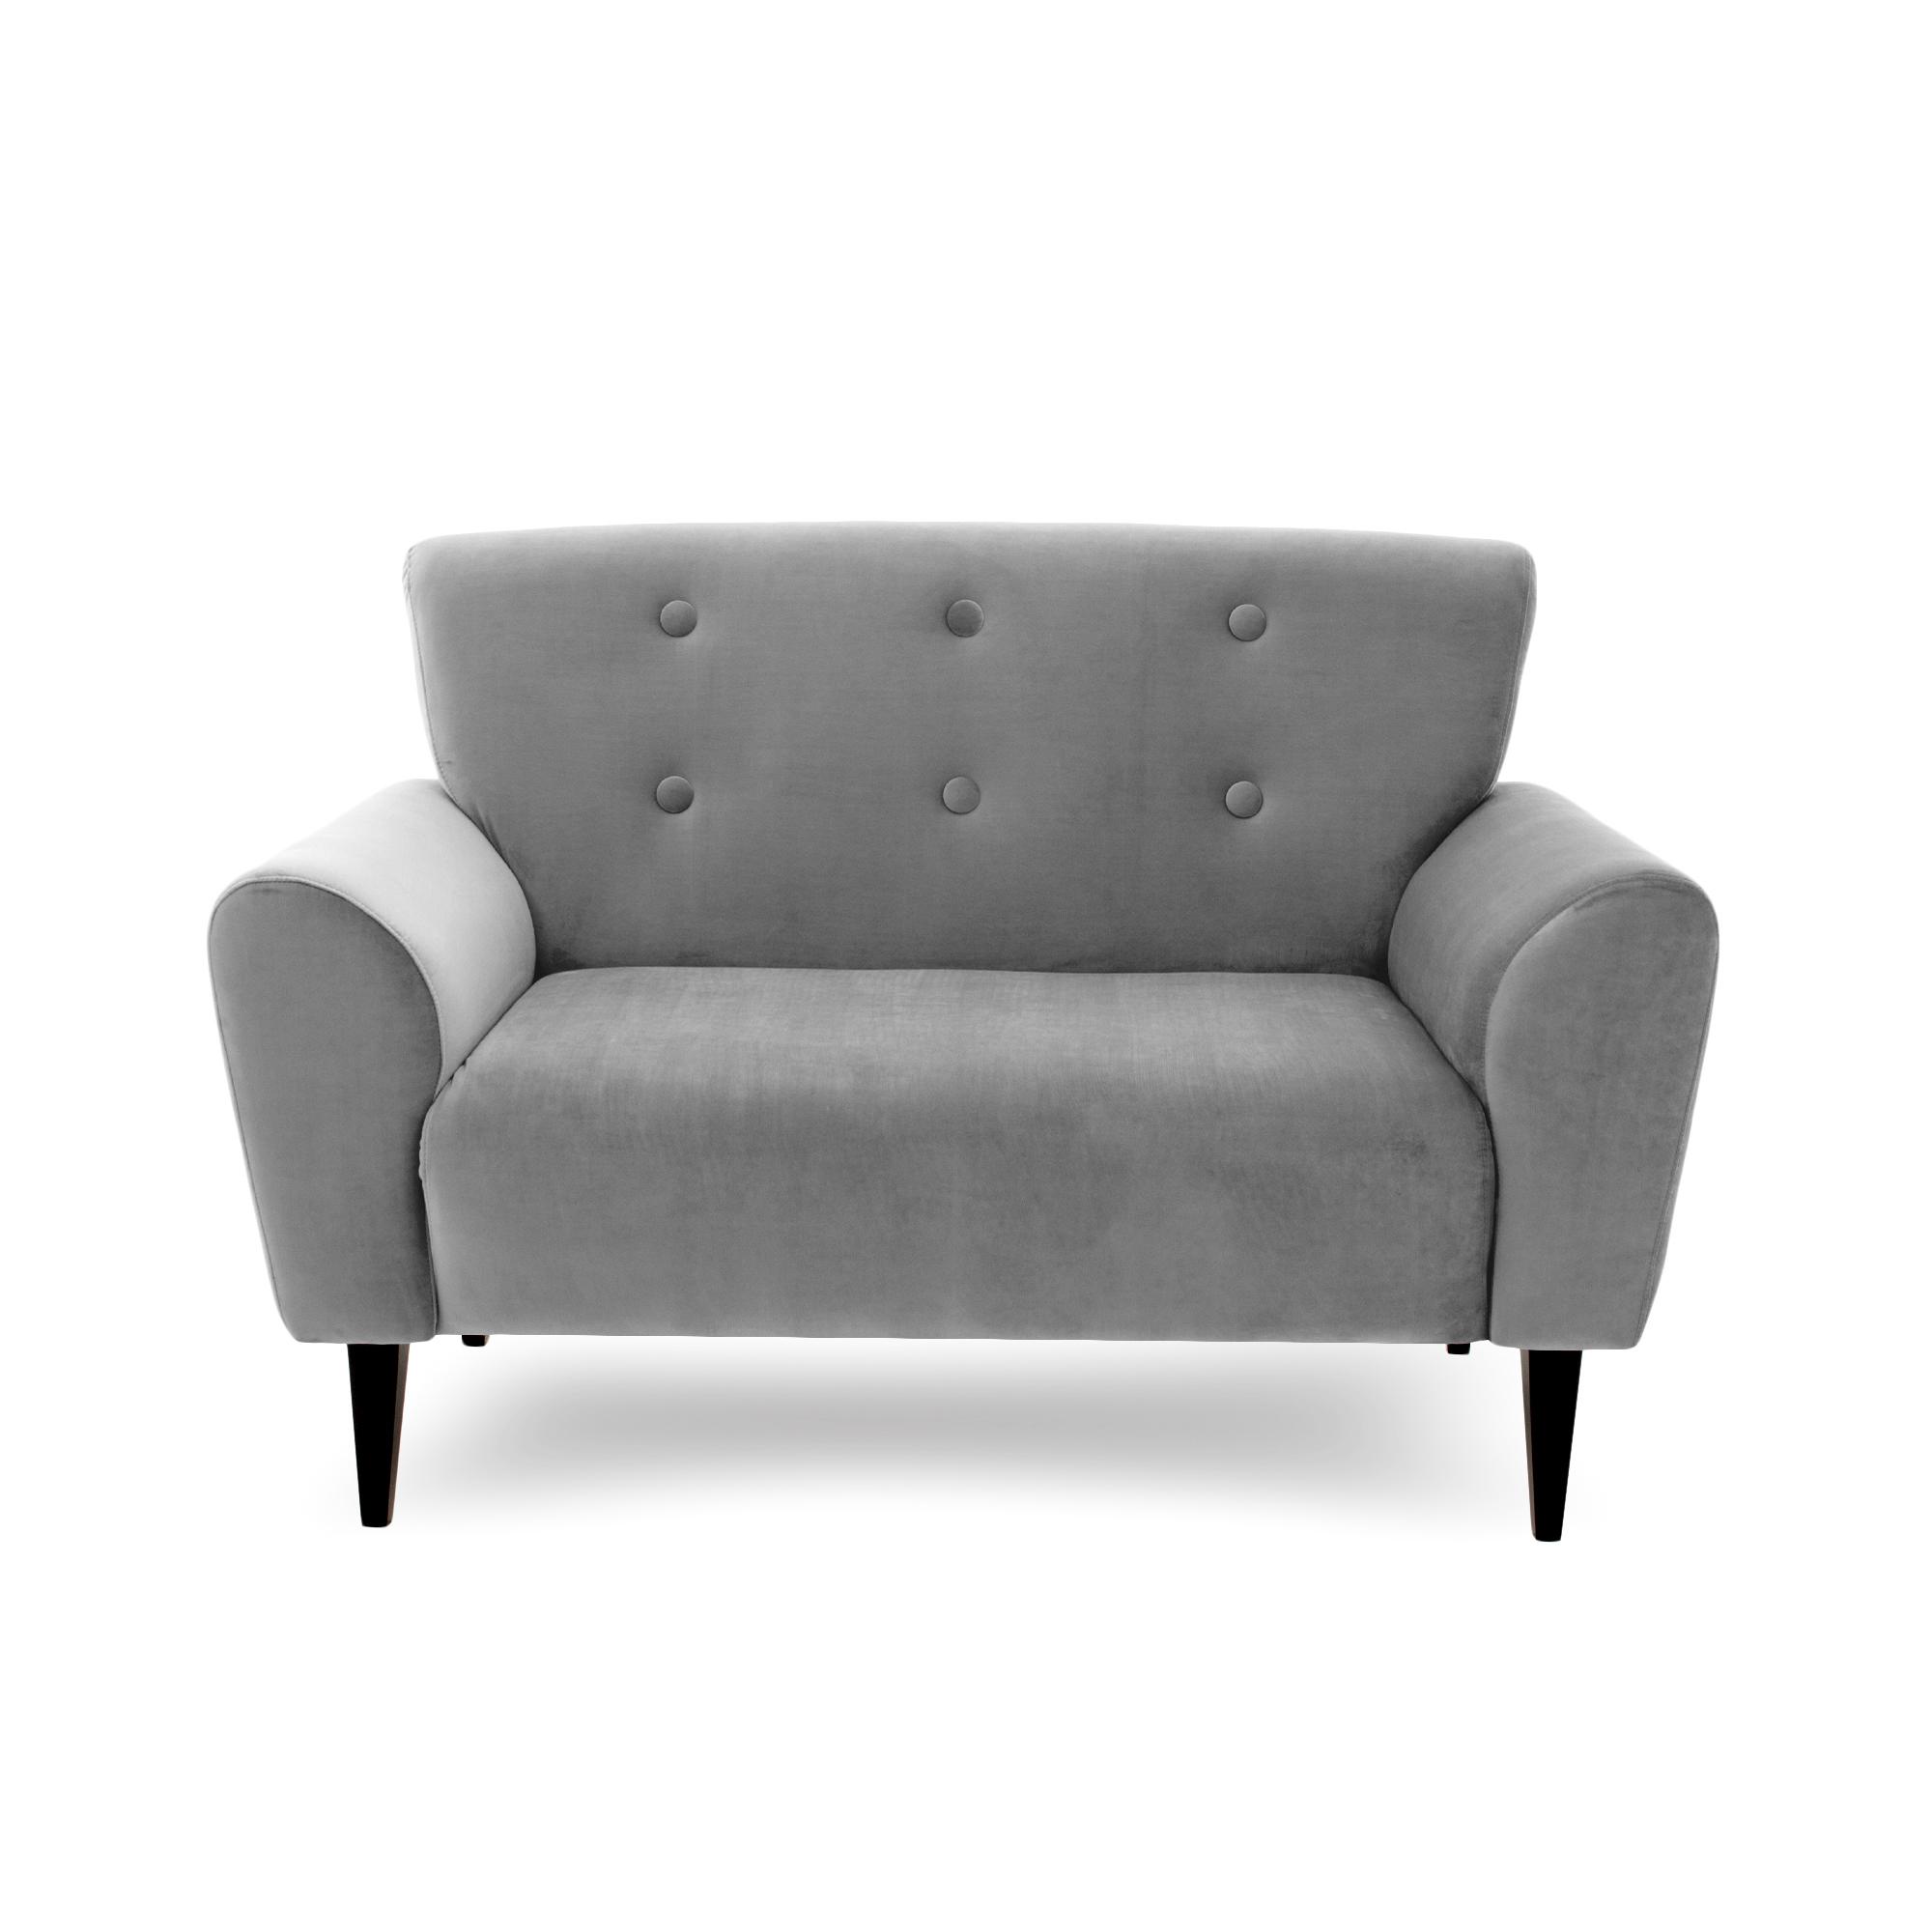 Canapea Fixa 2 locuri Kiara Silver